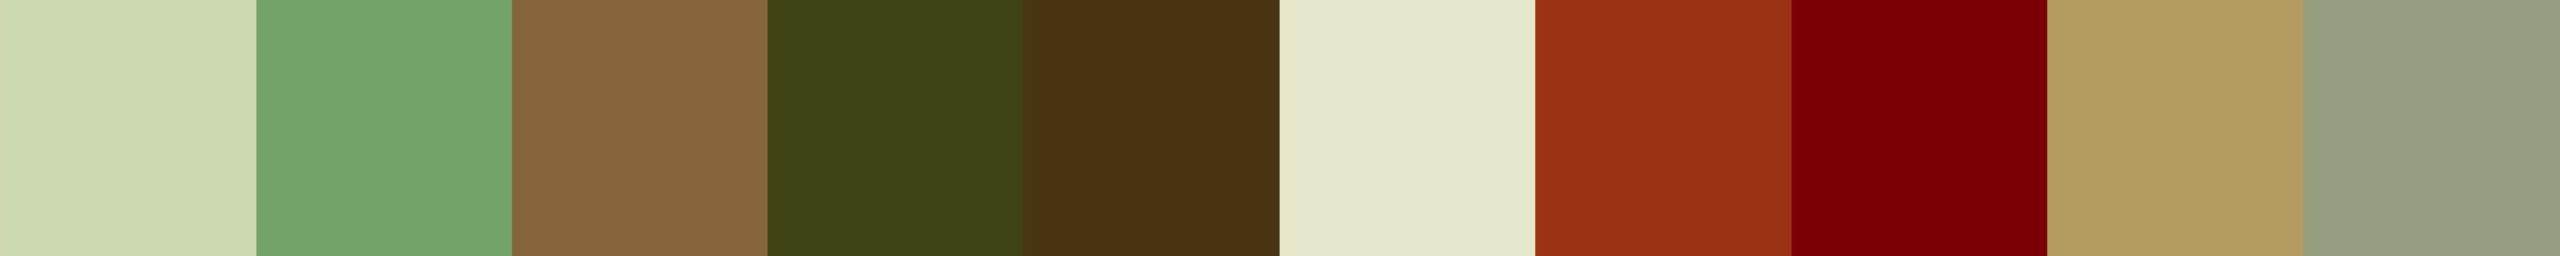 607 Peridria Color Palette